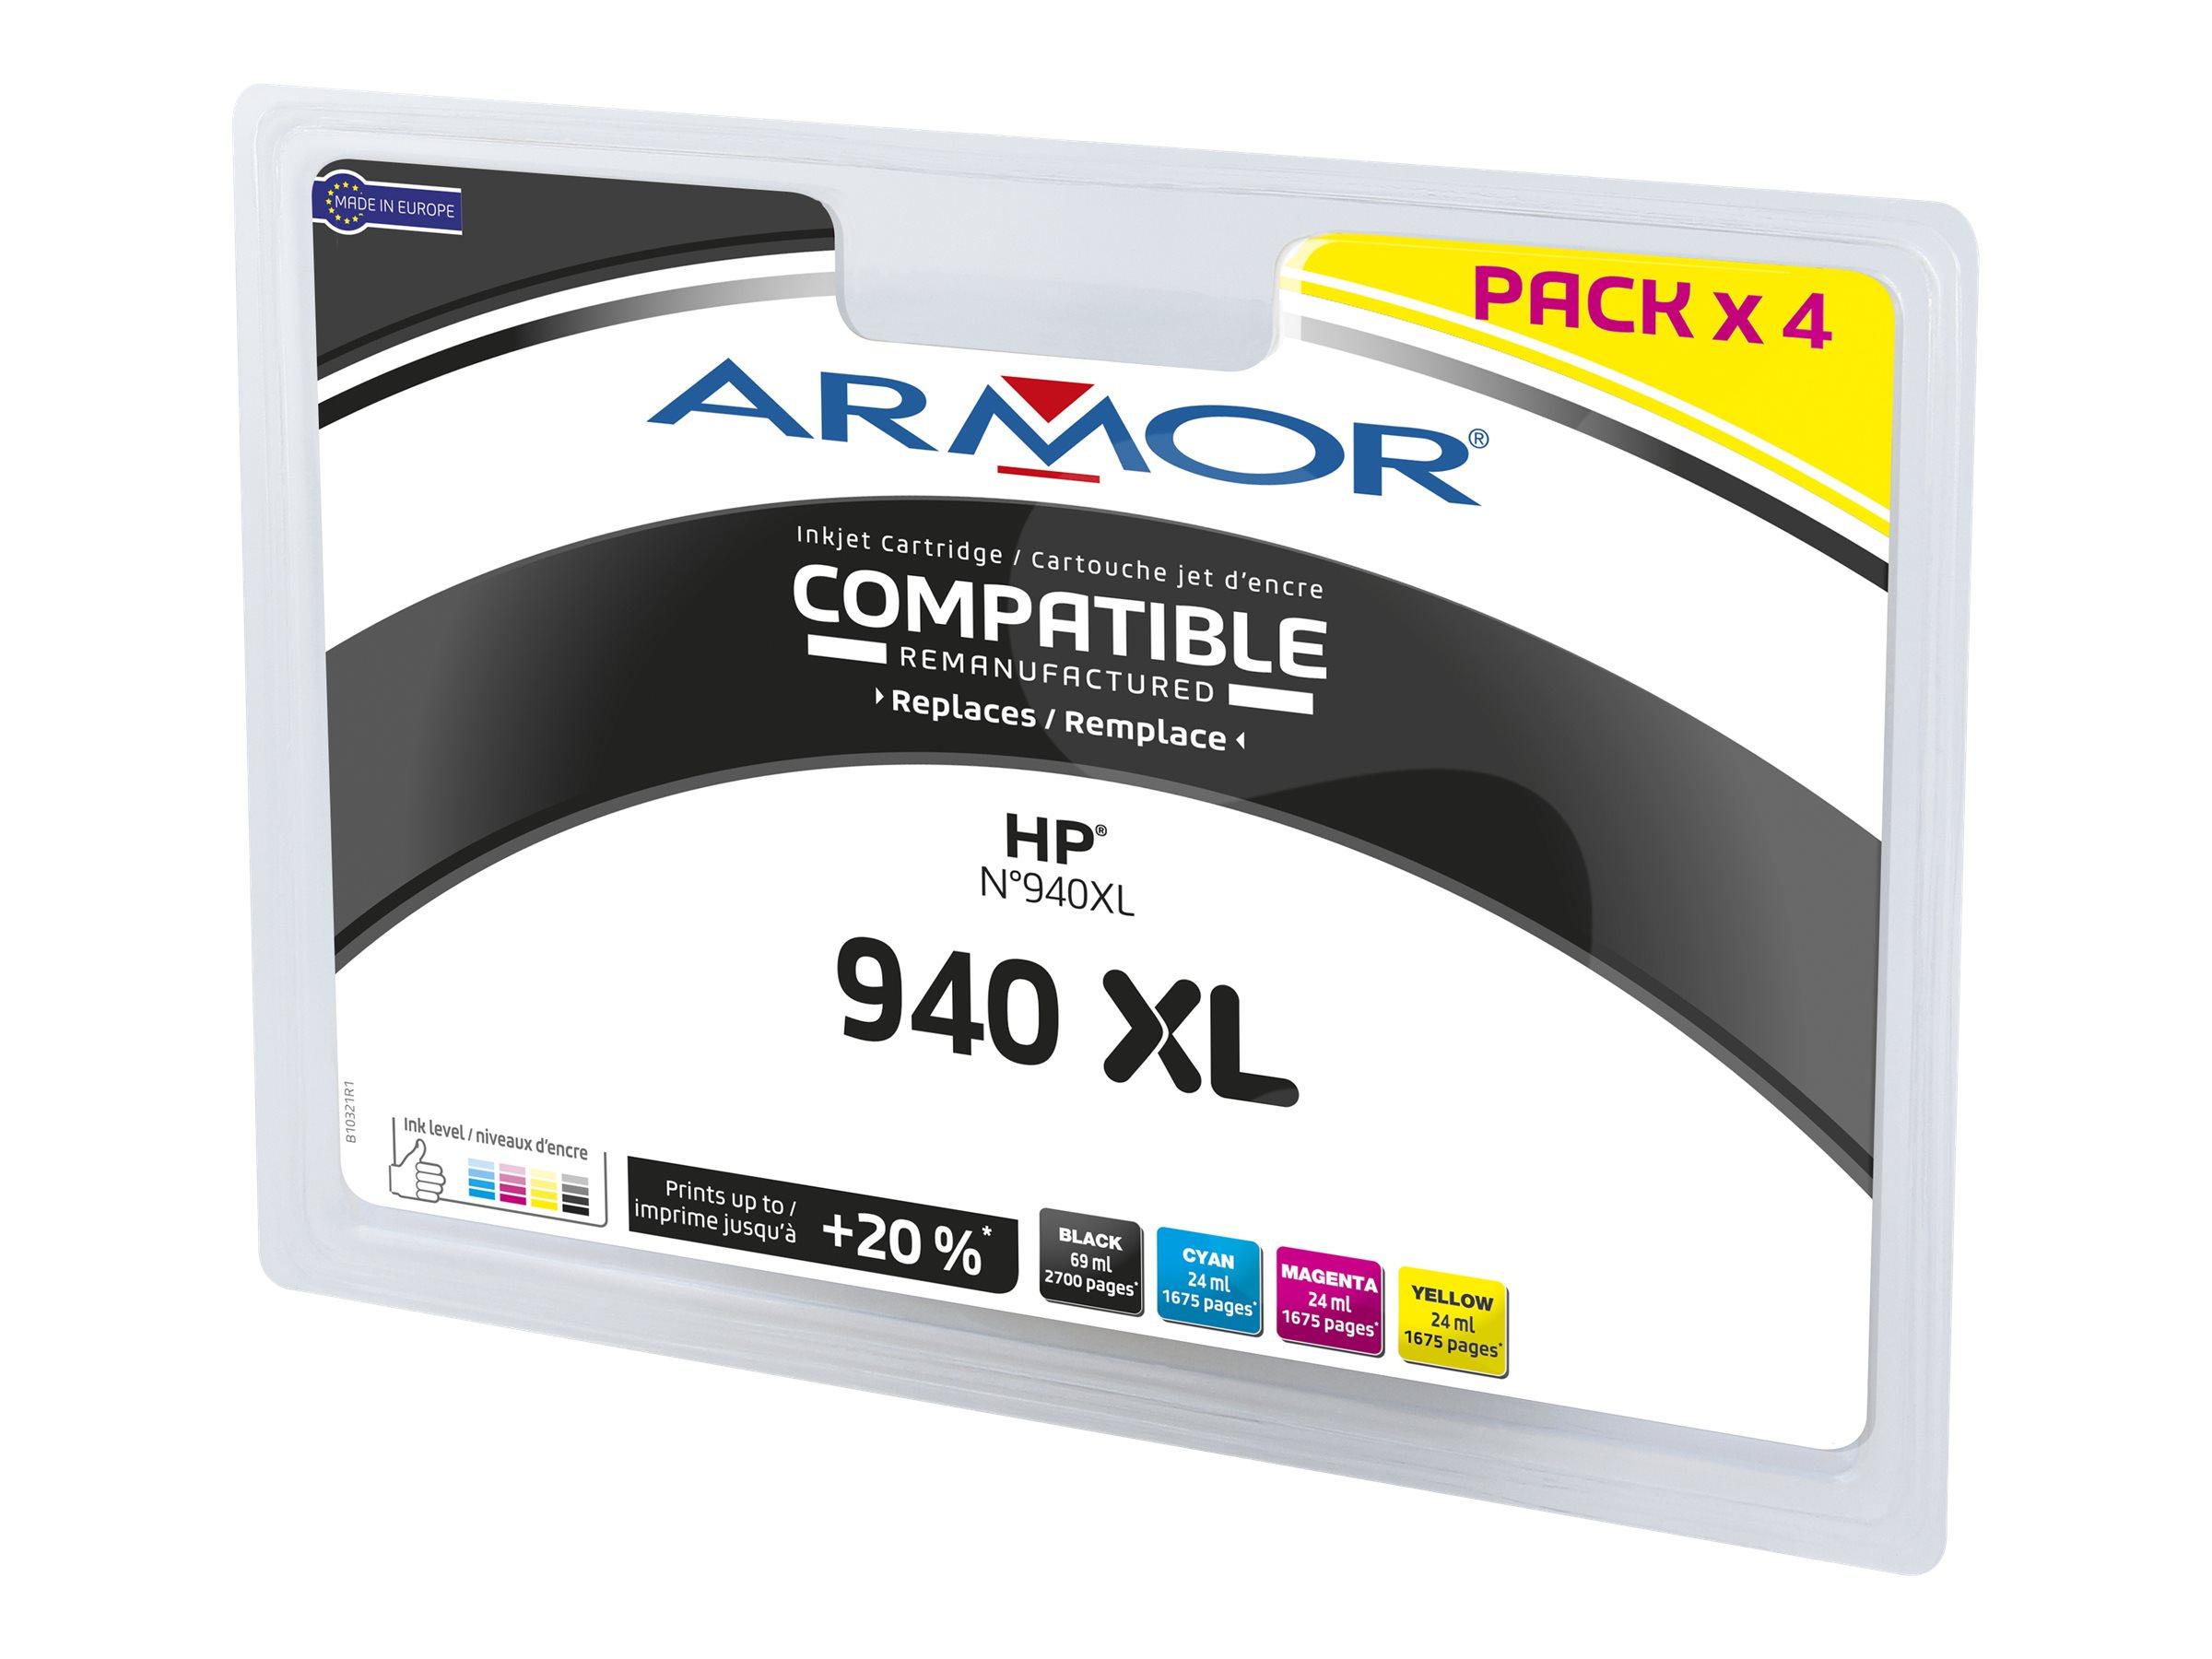 Armor B10321R1 - pack de 4 - noir, jaune, cyan, magenta - cartouche d'encre (alternative for: HP 940XL)